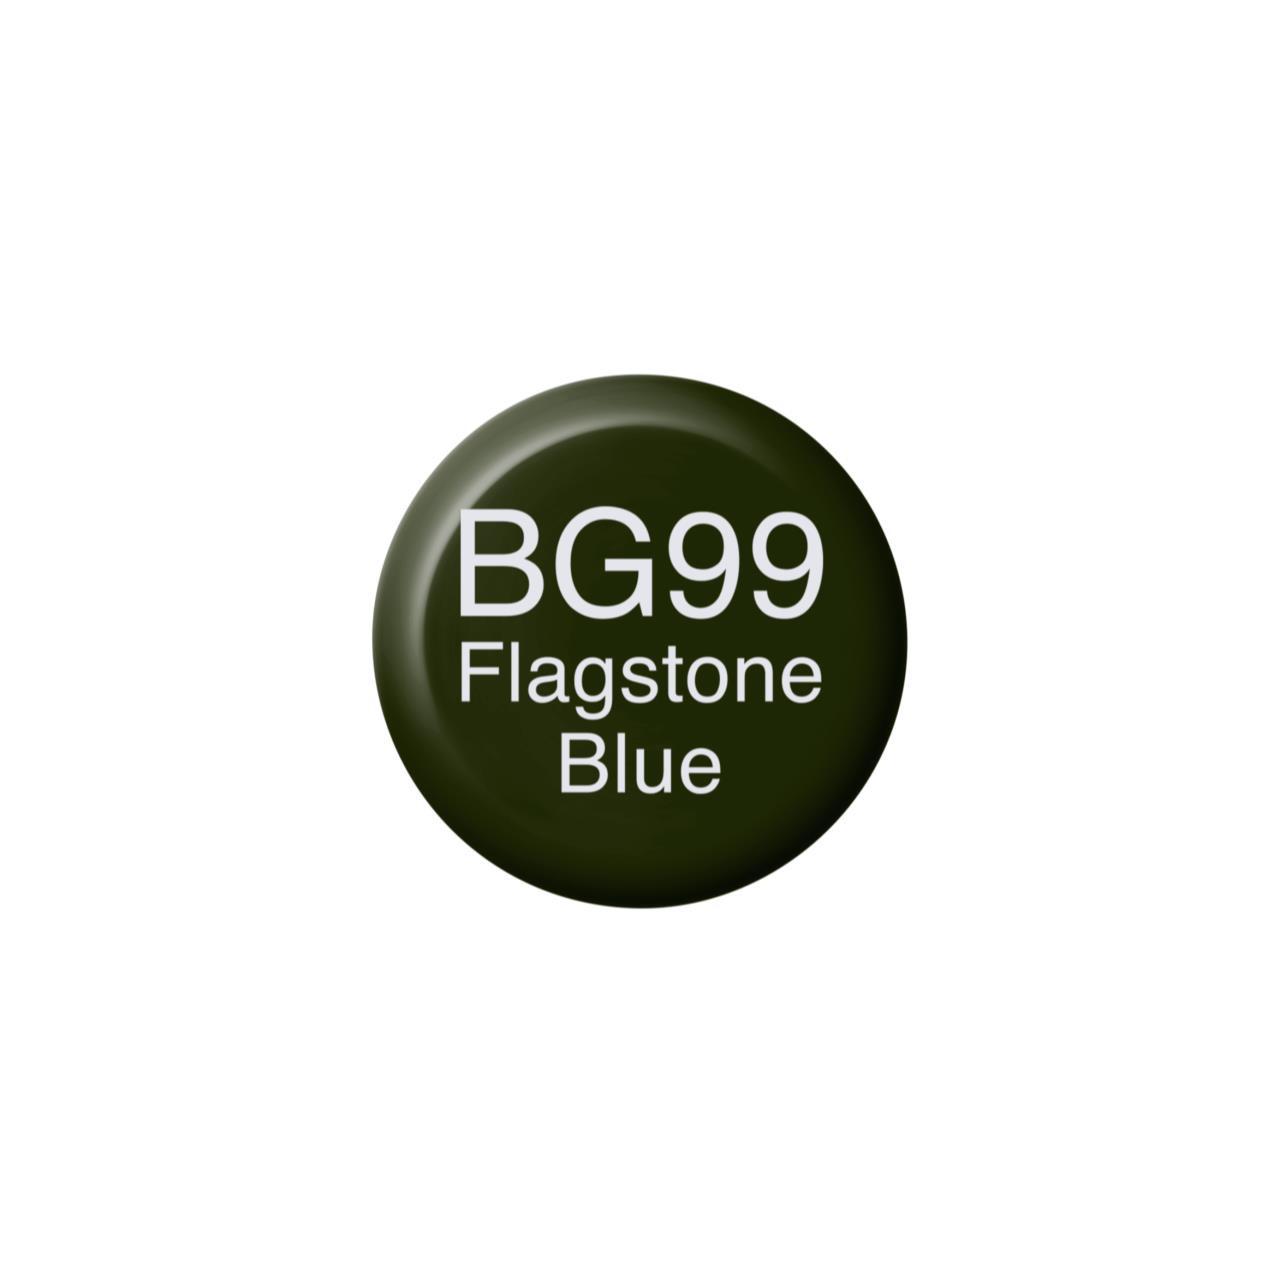 BG99 Flagstone Blue, Copic Ink - 4511338056417